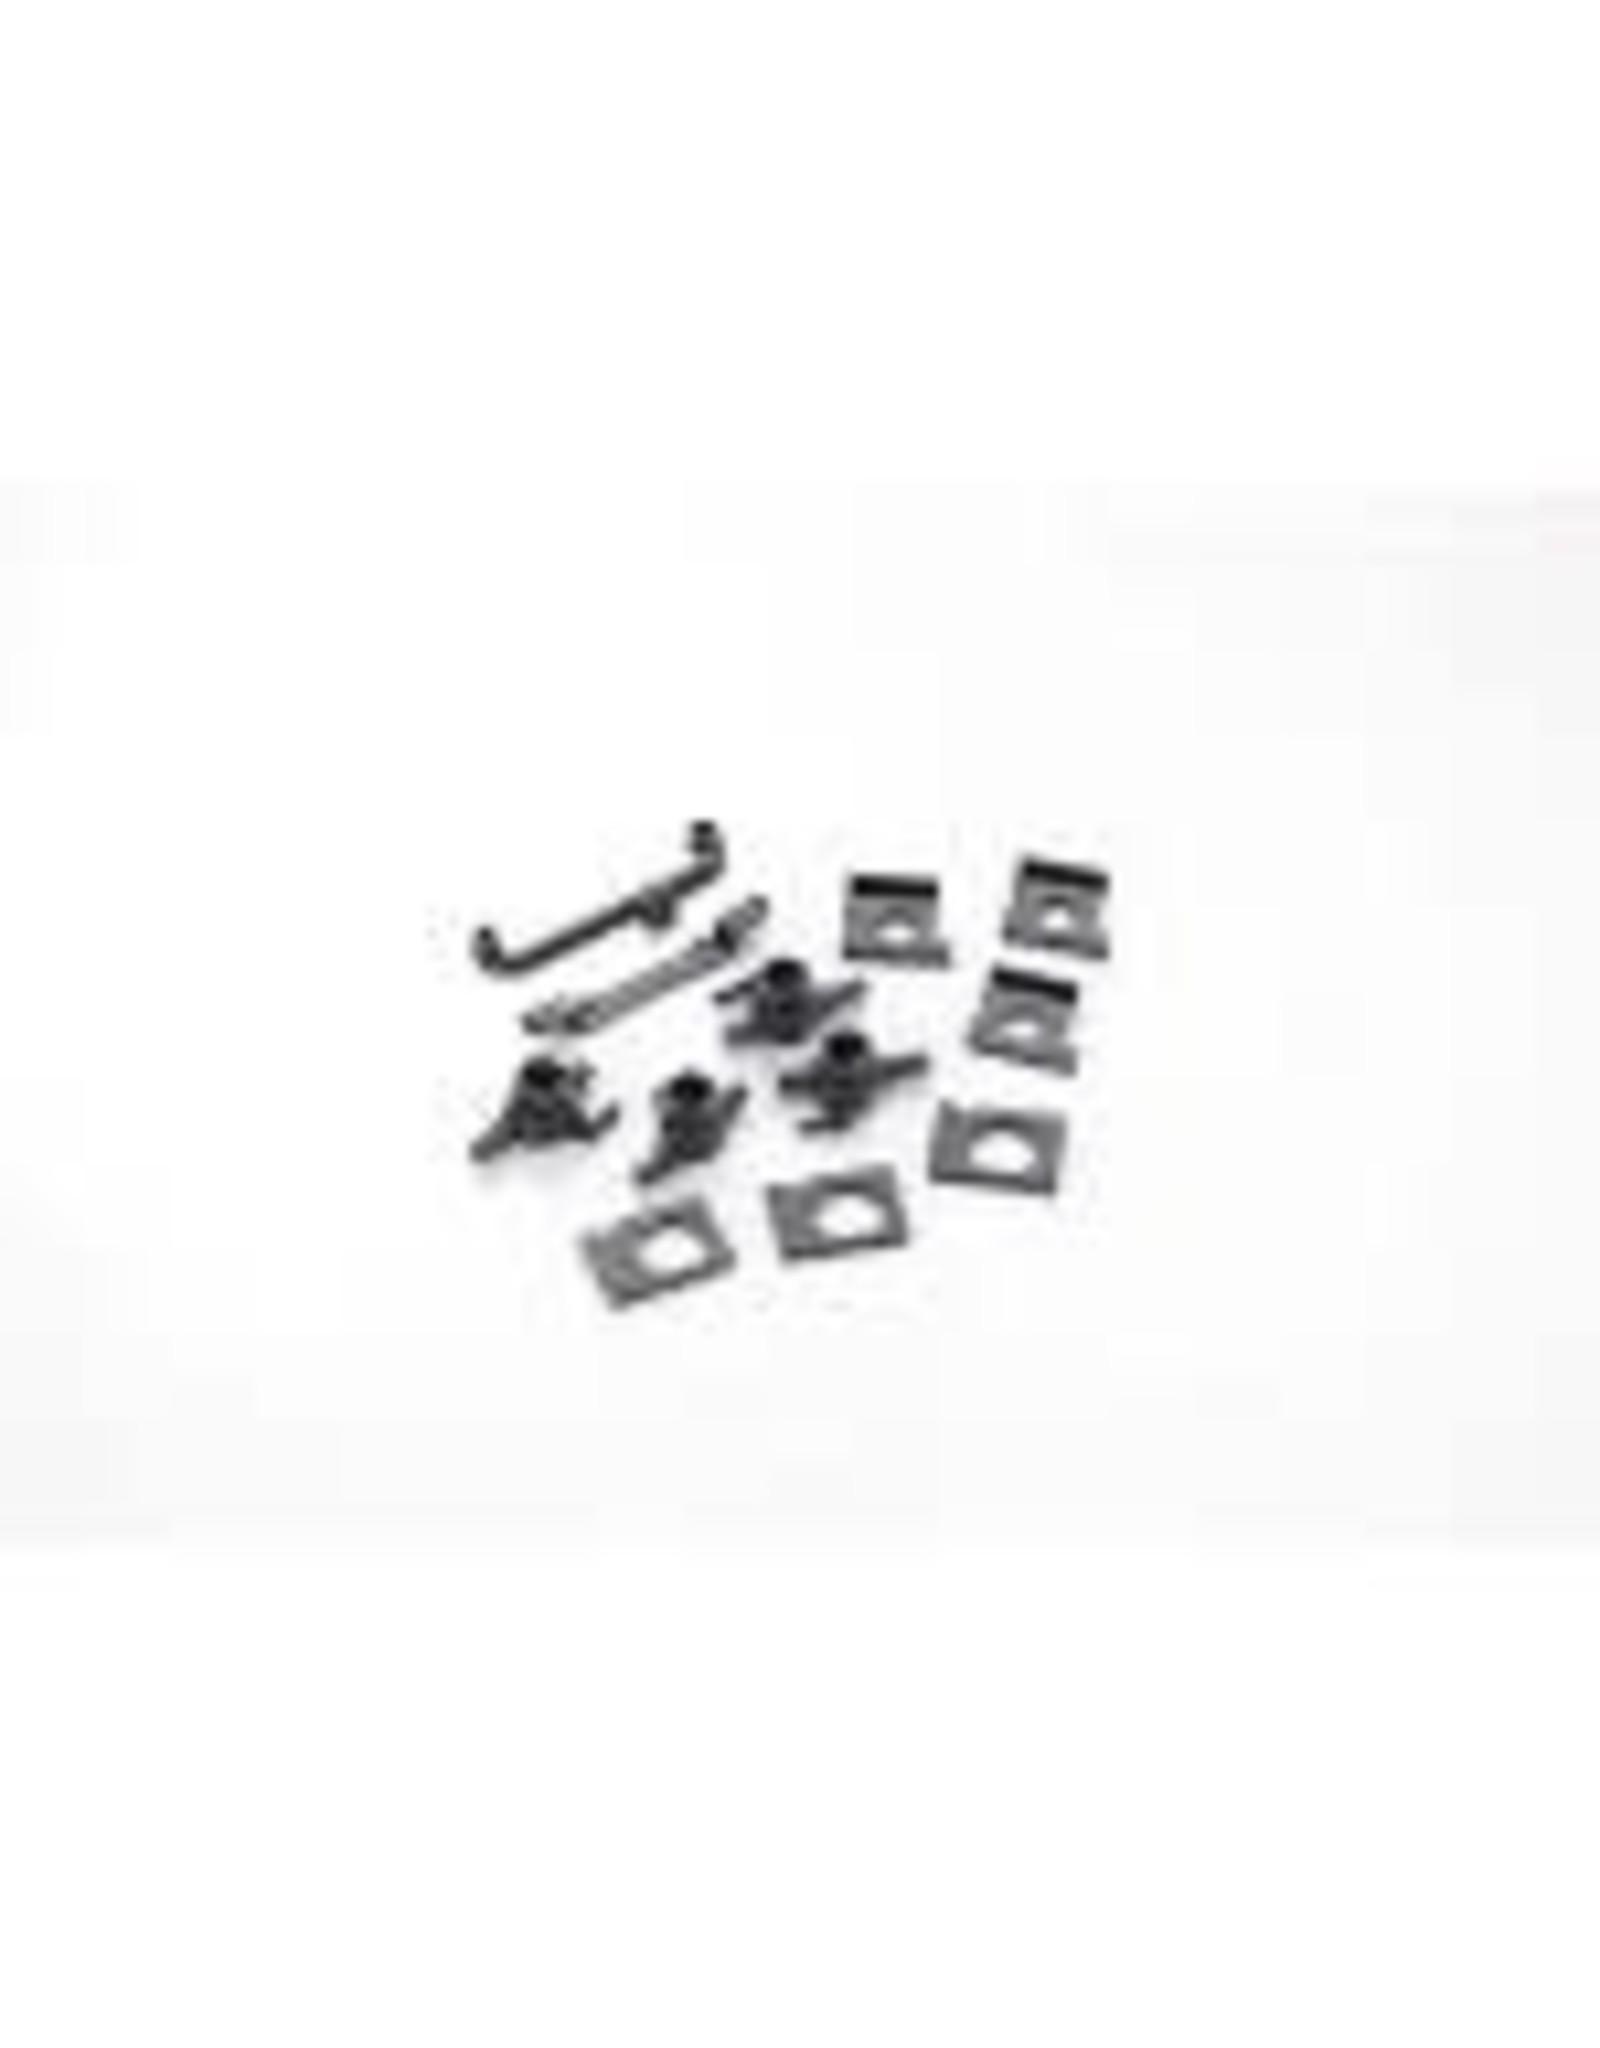 Kyosho Knuckle & Motor Holder Set(MINI-Z AWD)